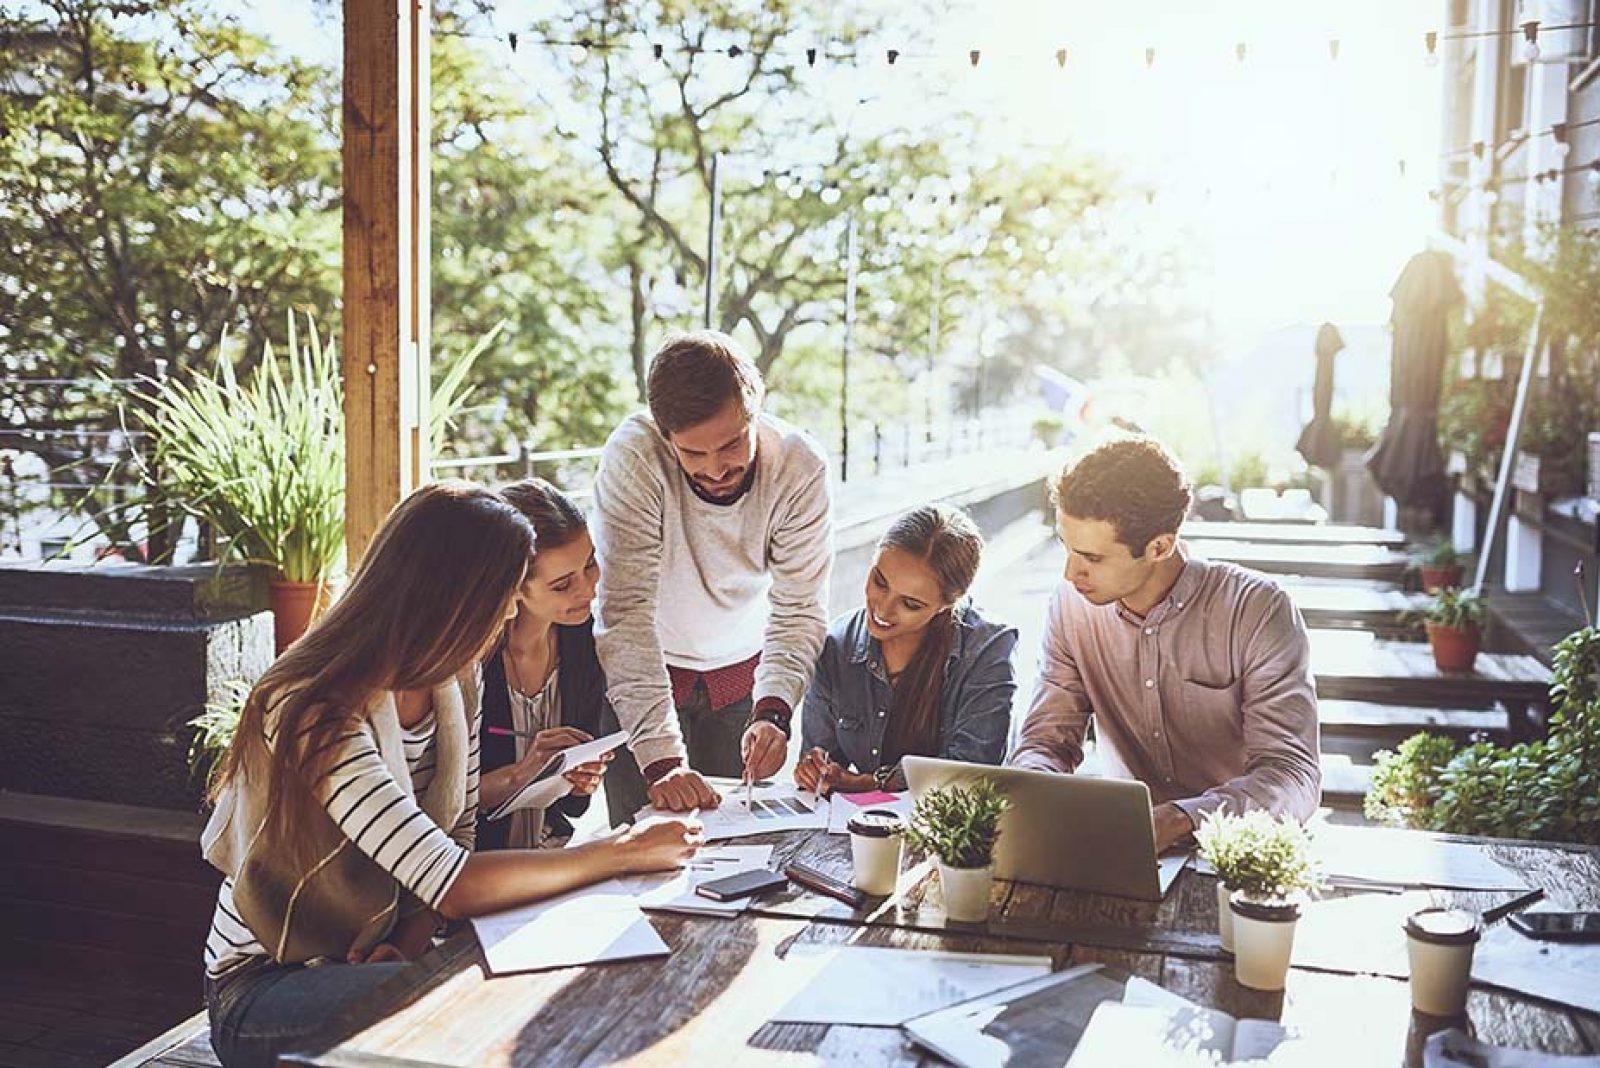 Digital marketing professionals working together